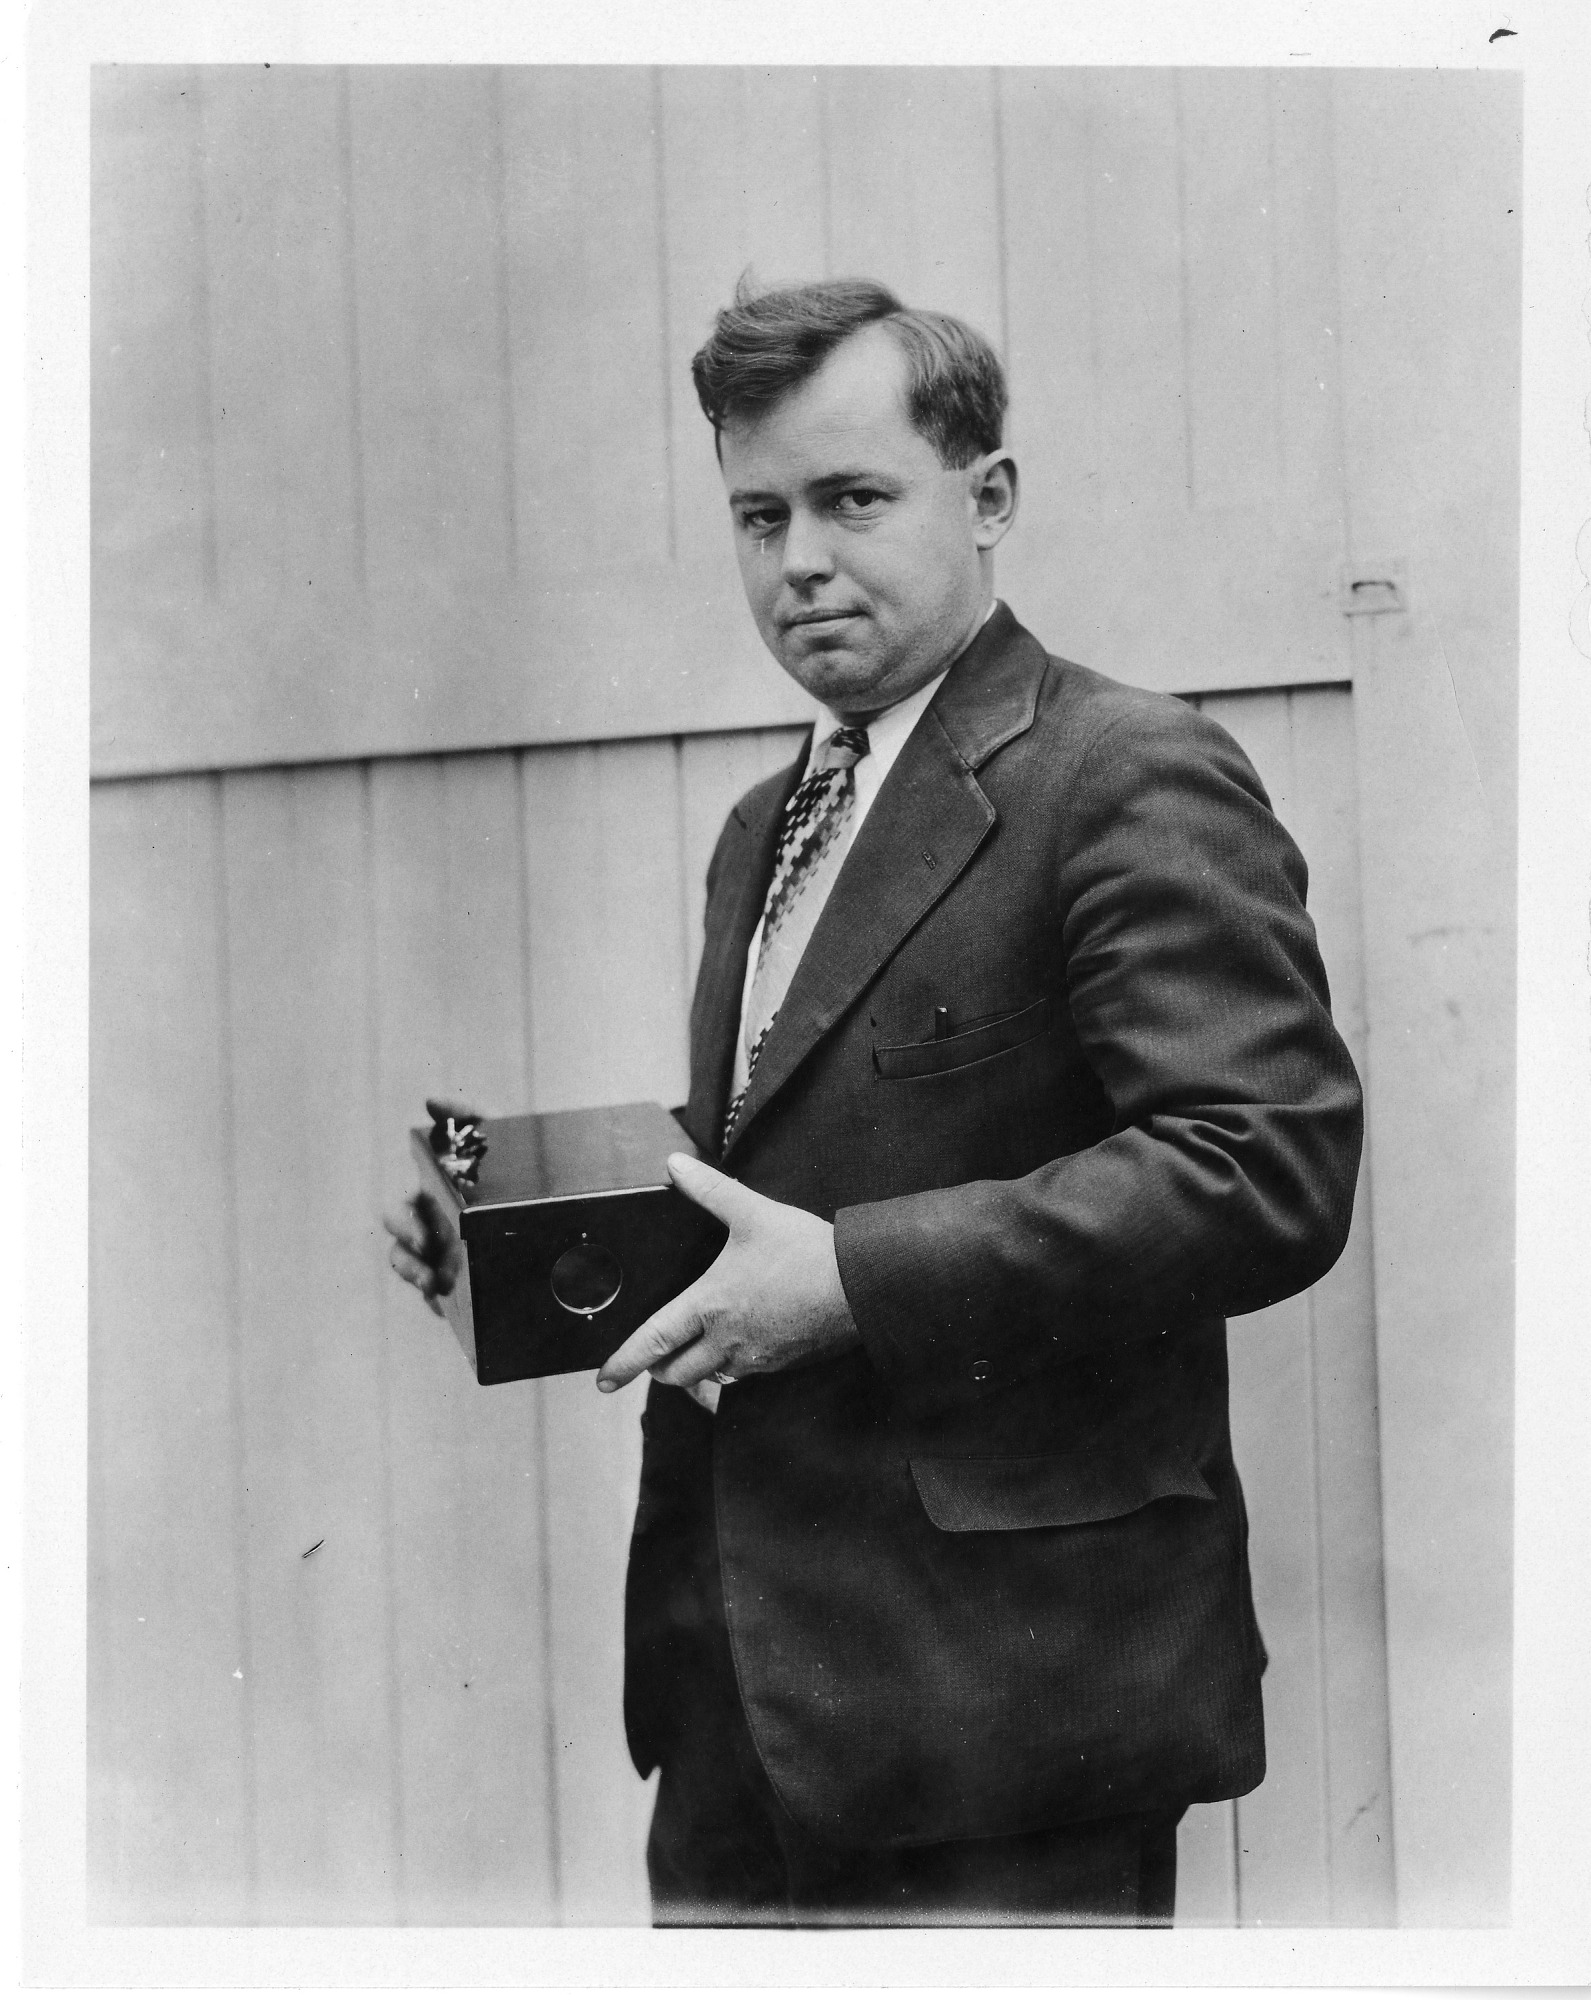 Robert C. Burt (b. 1896), Smithsonian Institution Archives, SIA Acc. 90-105 [SIA2008-0087].